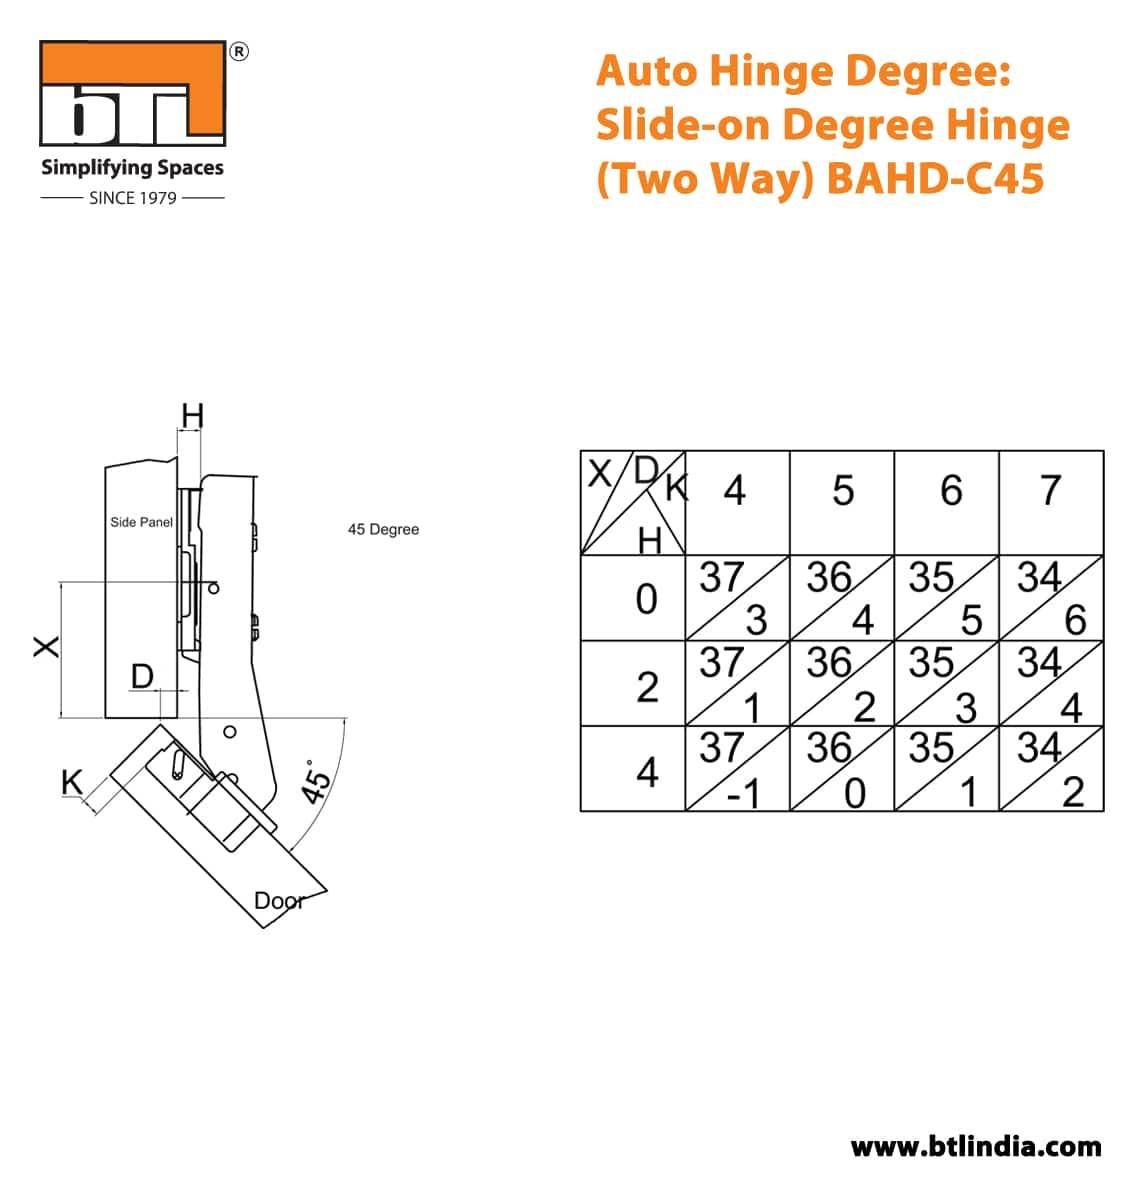 BTL BAHD-C45 Auto Hinge Degree: Slide-on Degree Hinge (Two Way) - Specifications